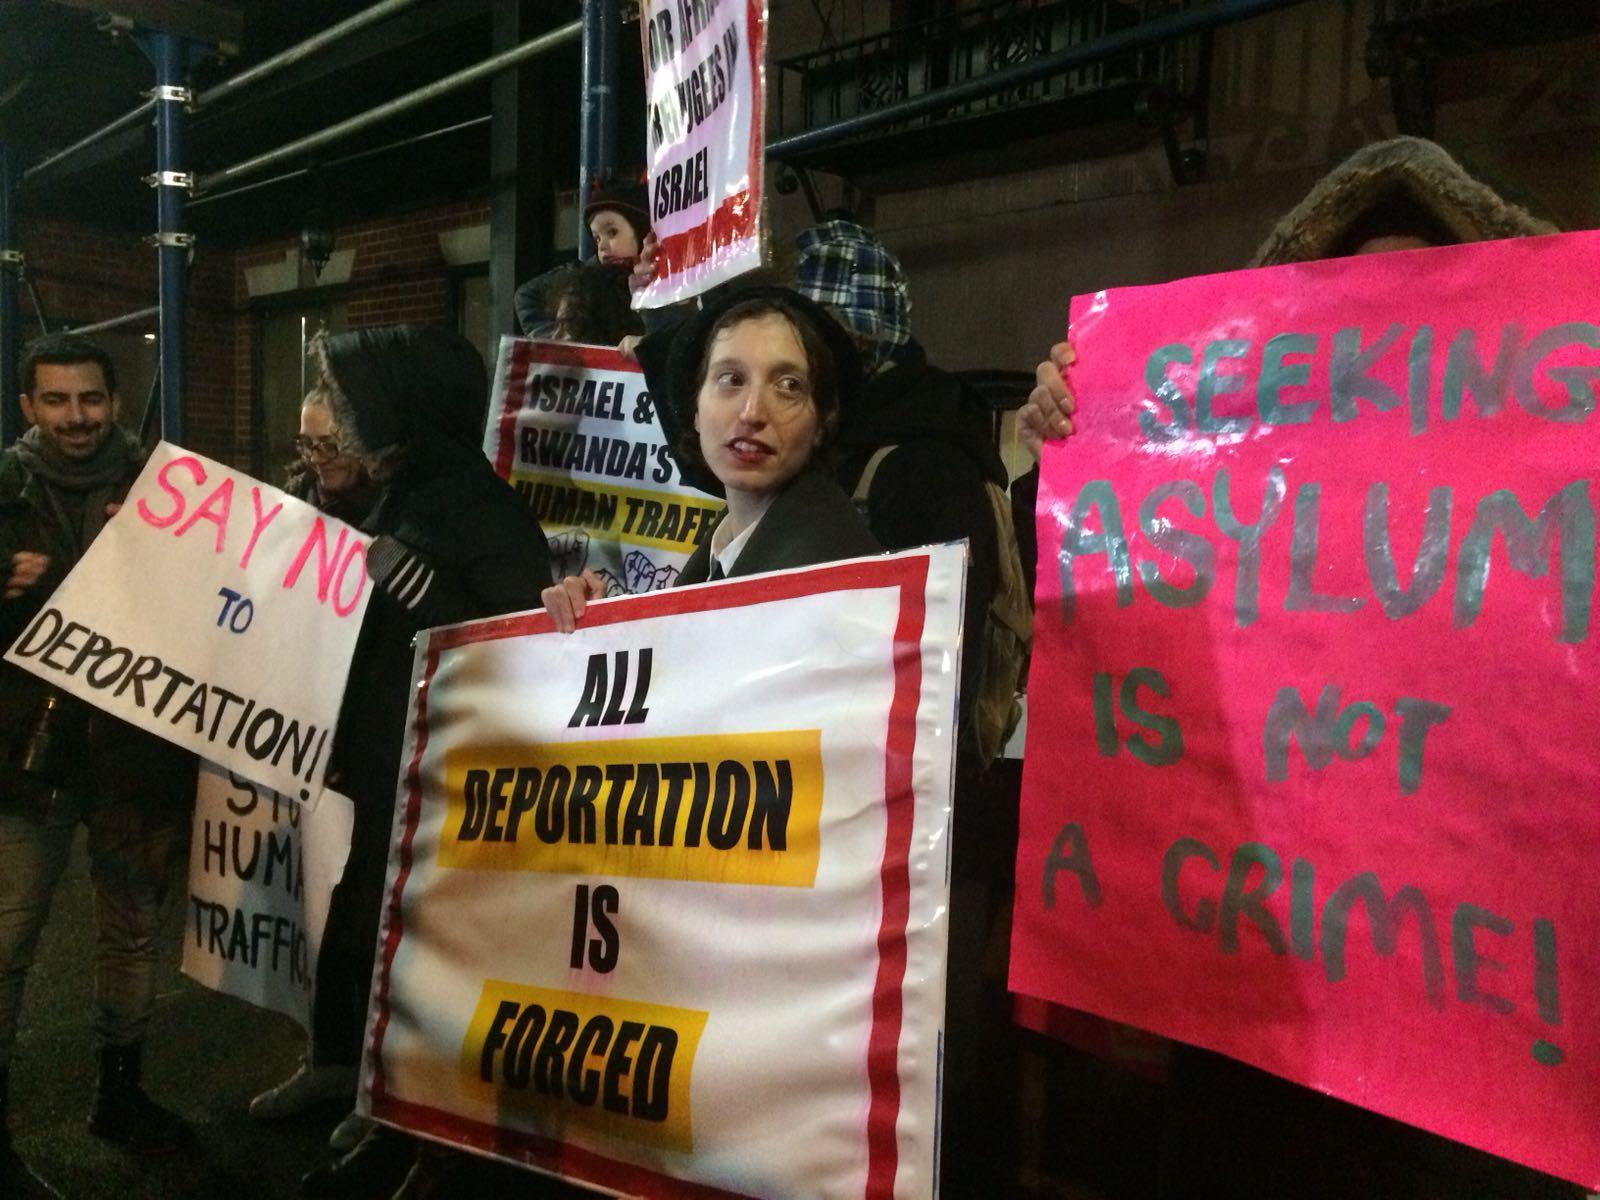 Anti-deportation protest outside the Rwandan UN mission in Manhattan, February 7, 2018.